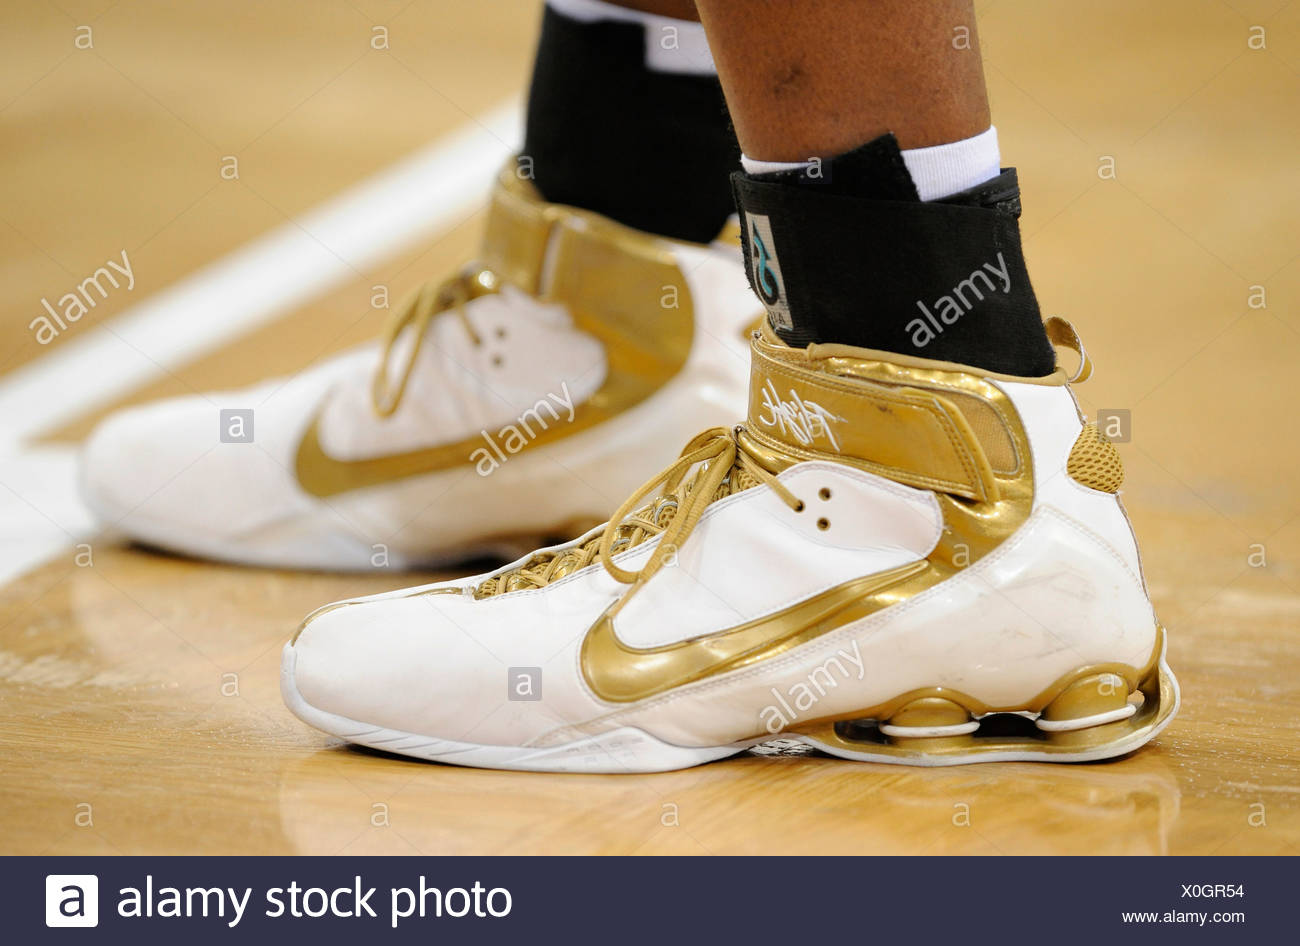 0031306a Basketball shoes Stock Photo: 275735296 - Alamy